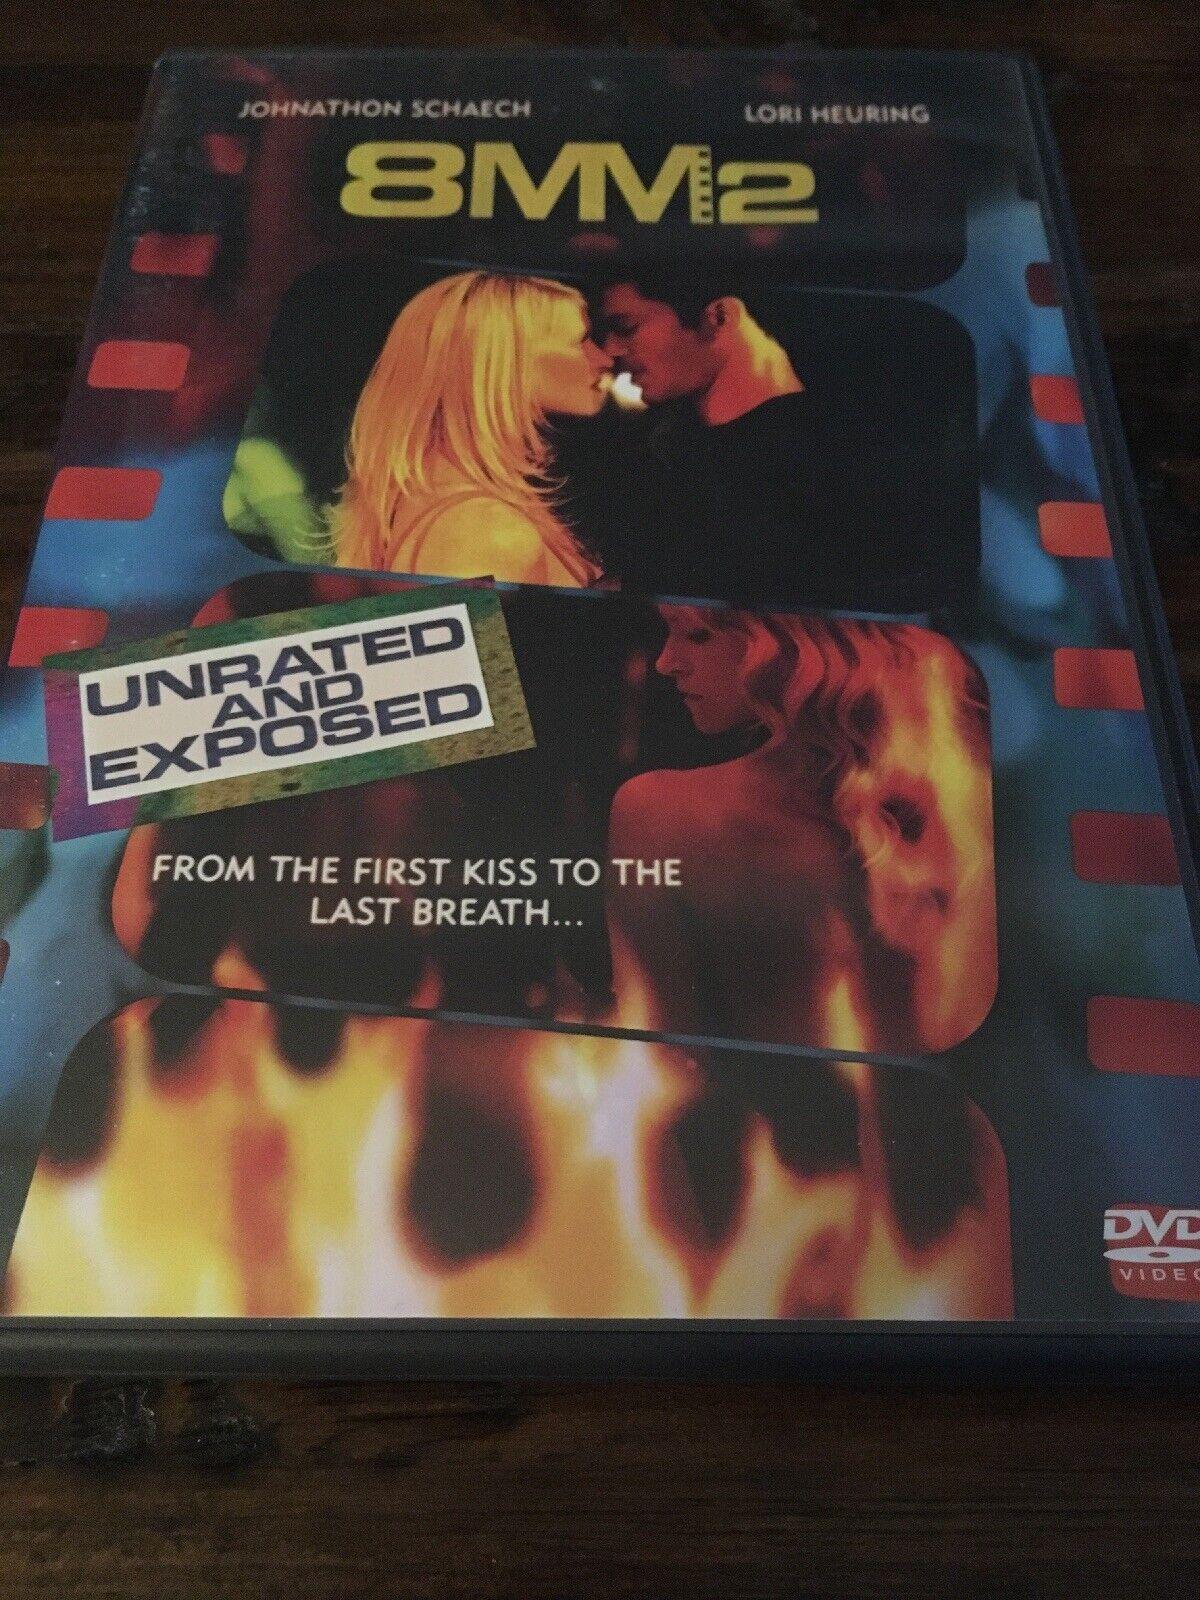 8Mm 2 Porn 8mm 2 (dvd, 2005)